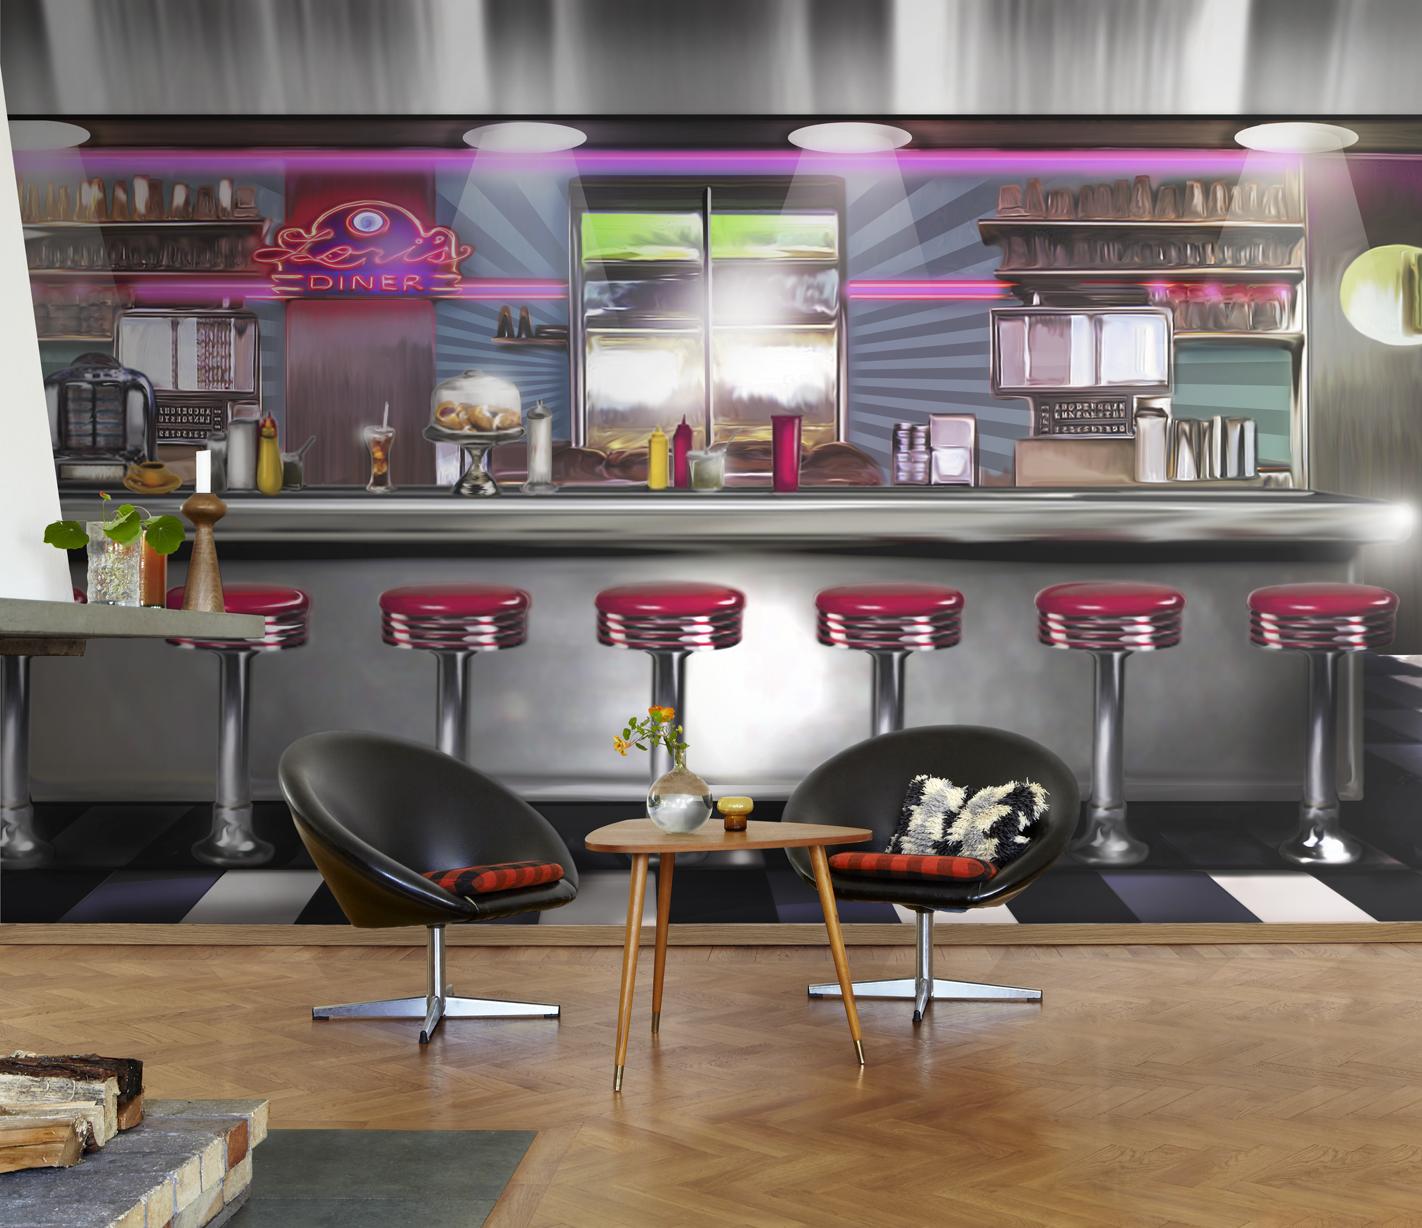 american diner wallpaper wallpapersafari. Black Bedroom Furniture Sets. Home Design Ideas